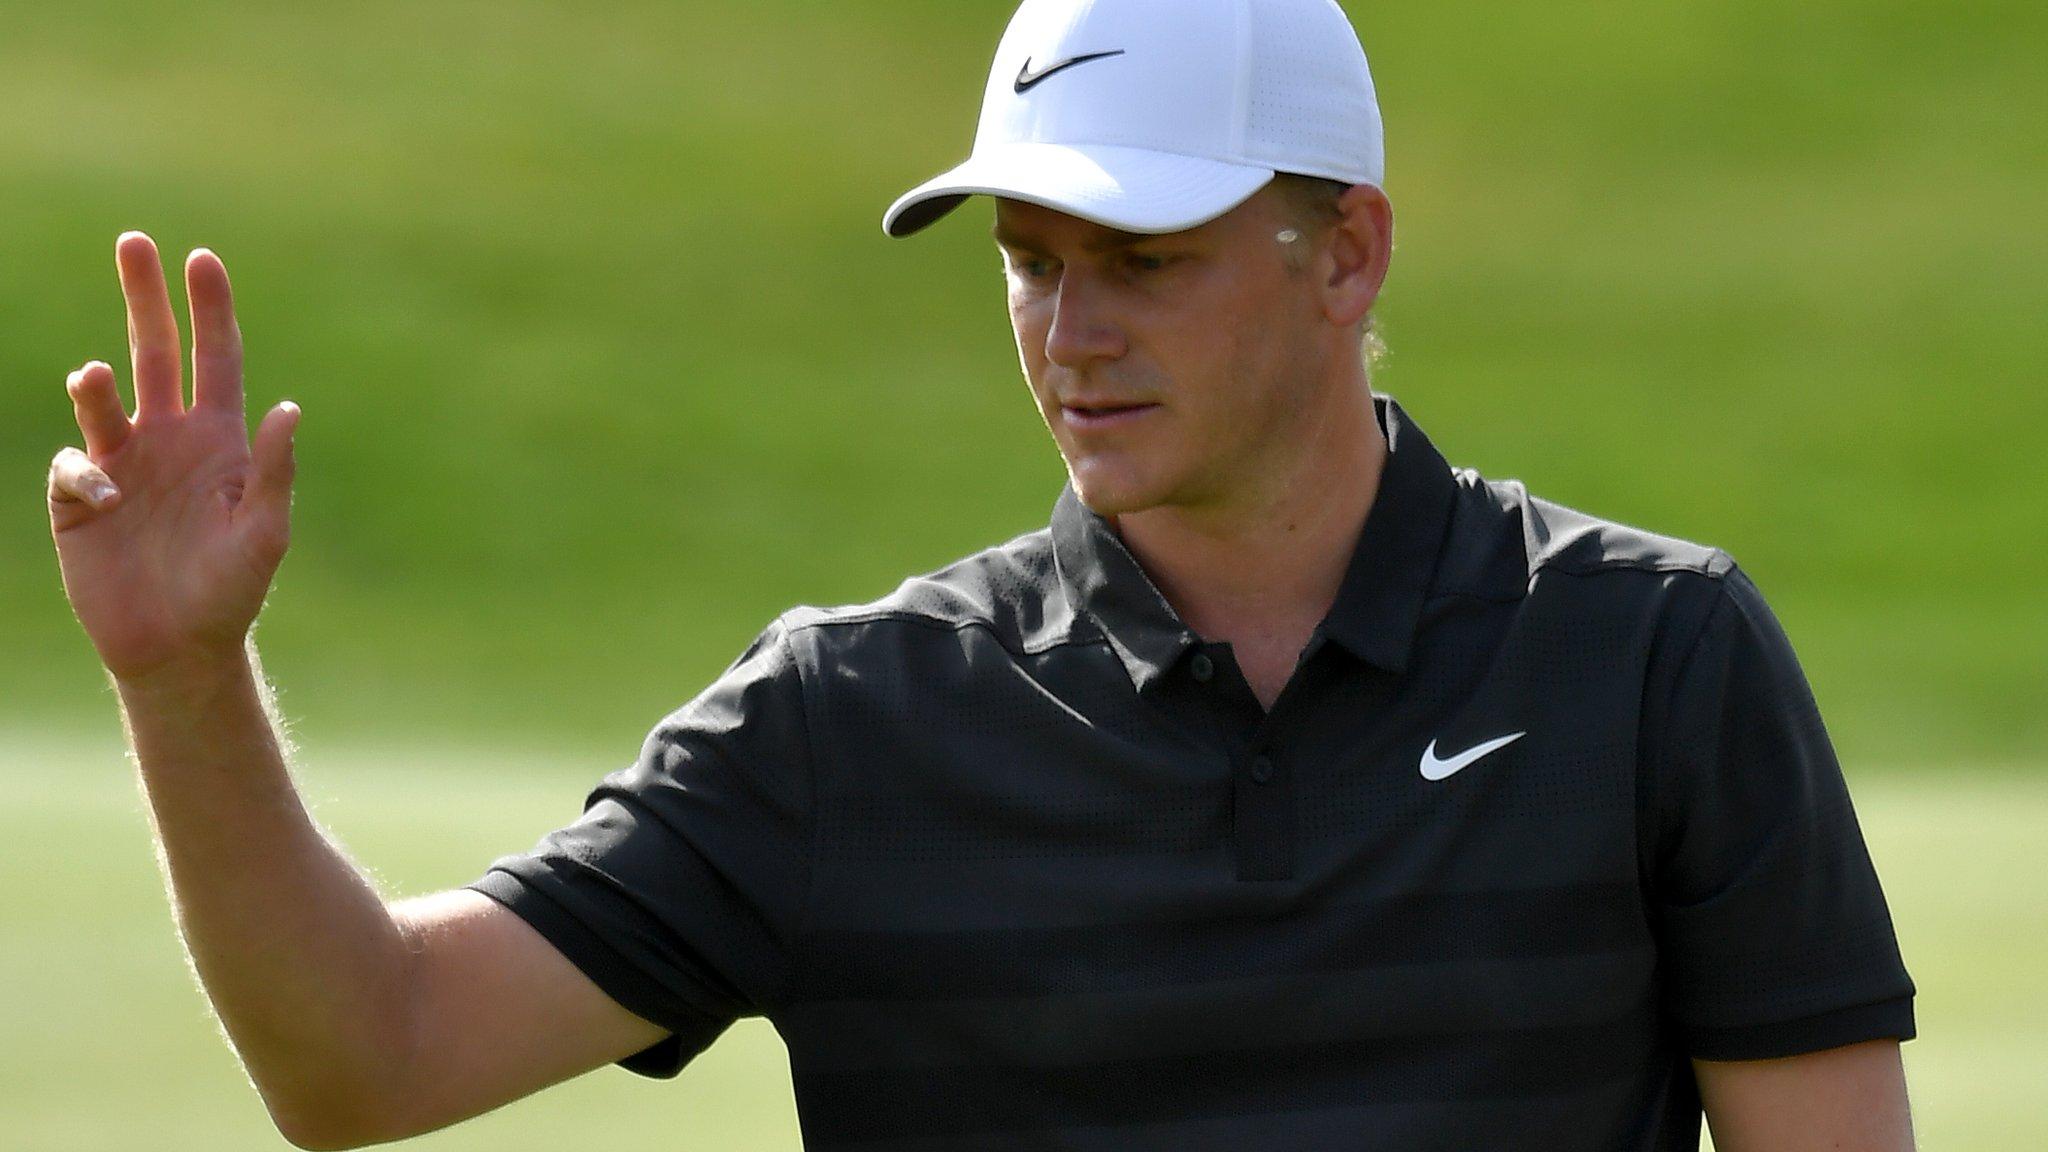 Desert Classic: Adam Long, world number 417, beats Phil Mickelson to win maiden PGA Tour title